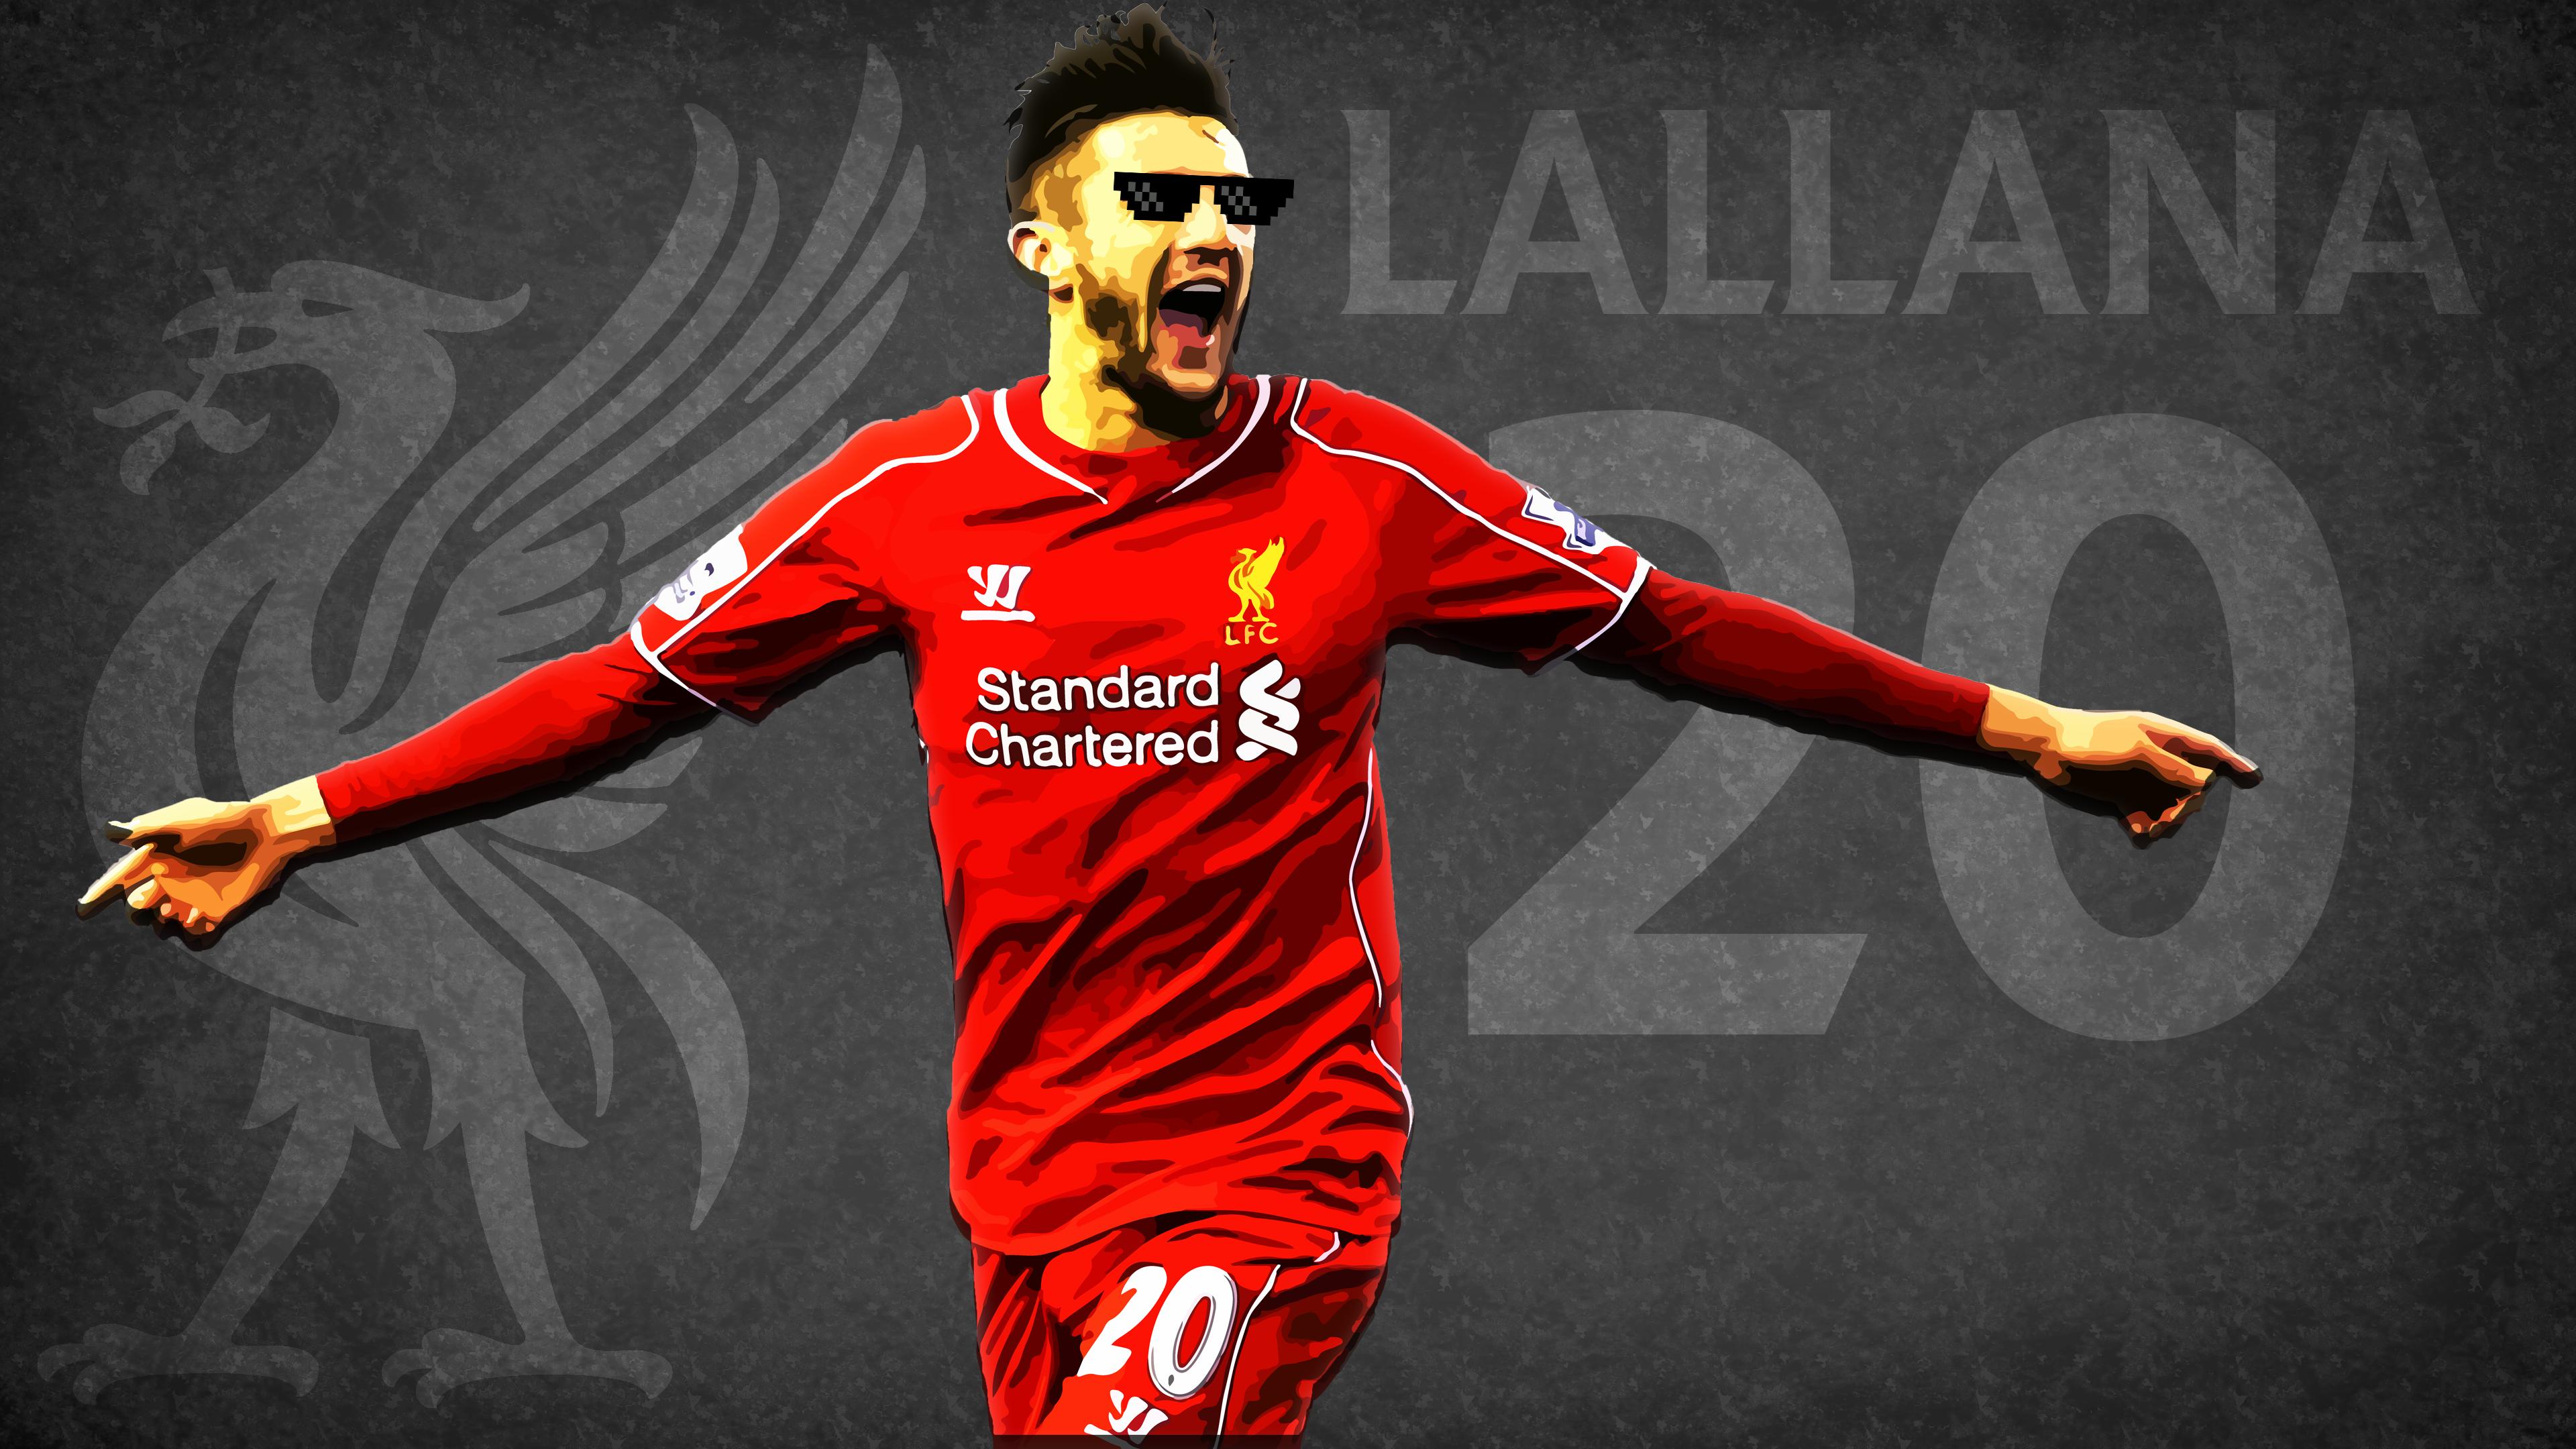 Adam Lallana Wallpaper For Coconut79 : LiverpoolFC